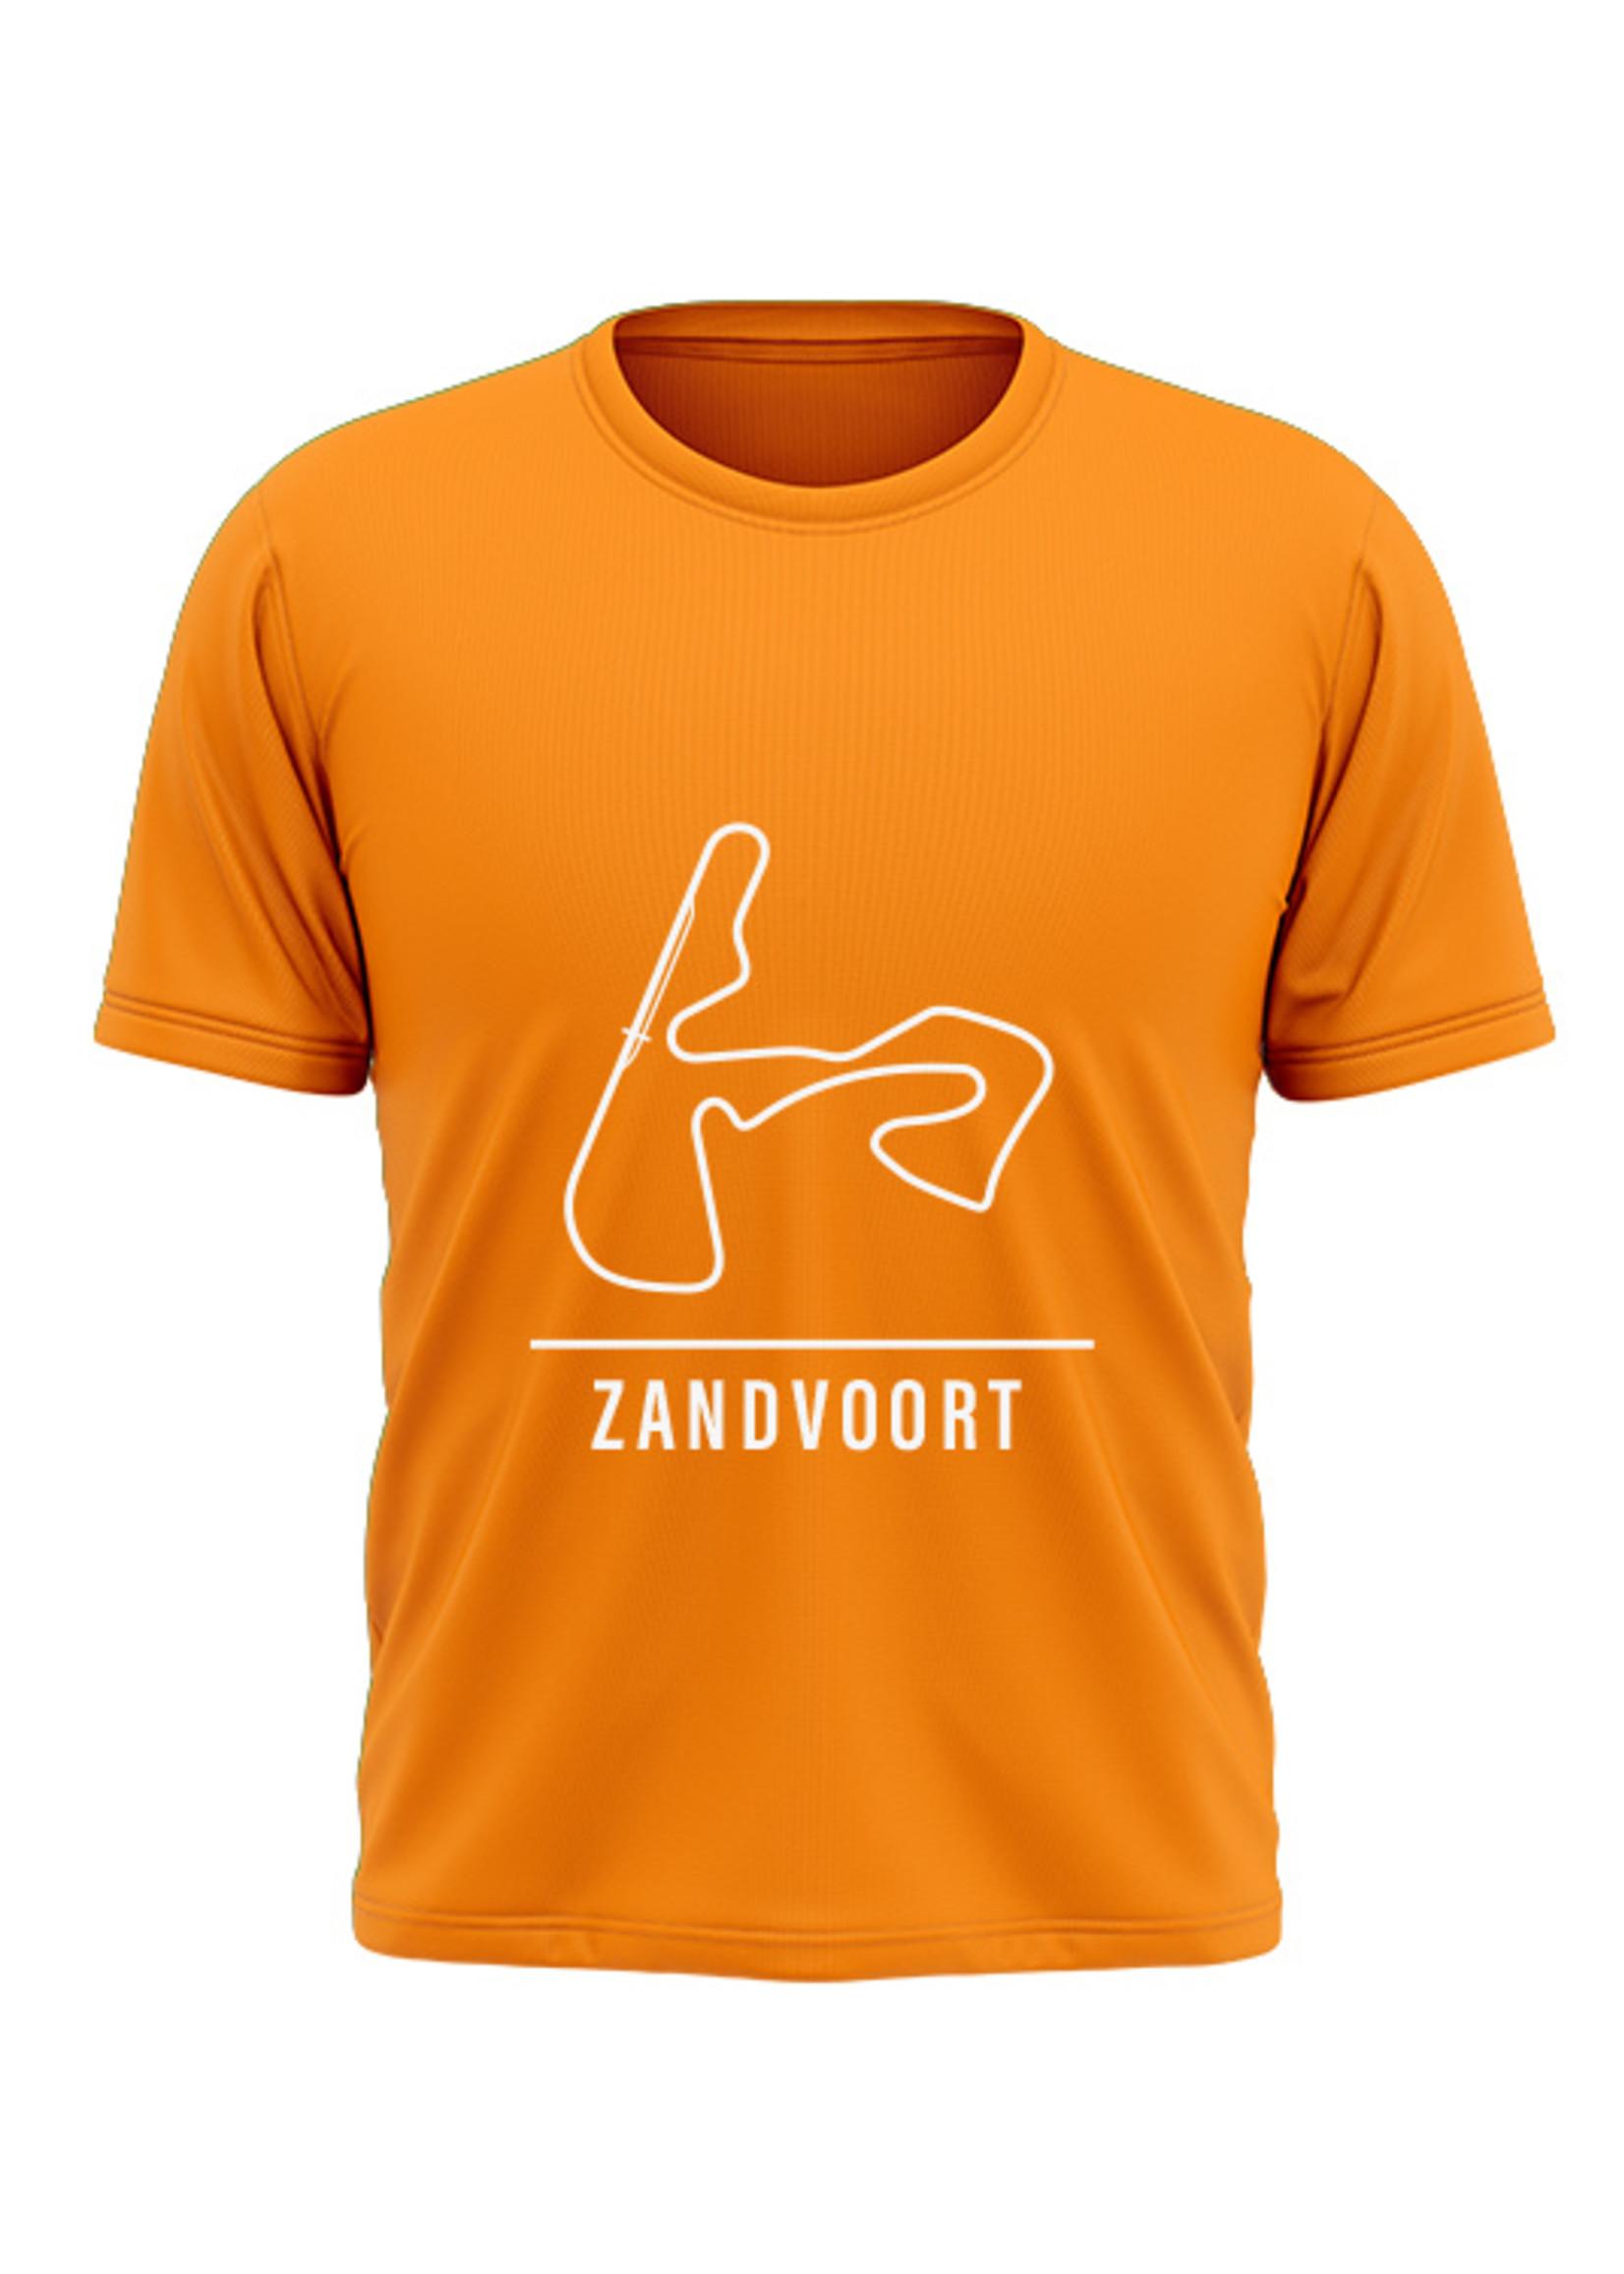 Rebel & Dutch Zandvoort circuit